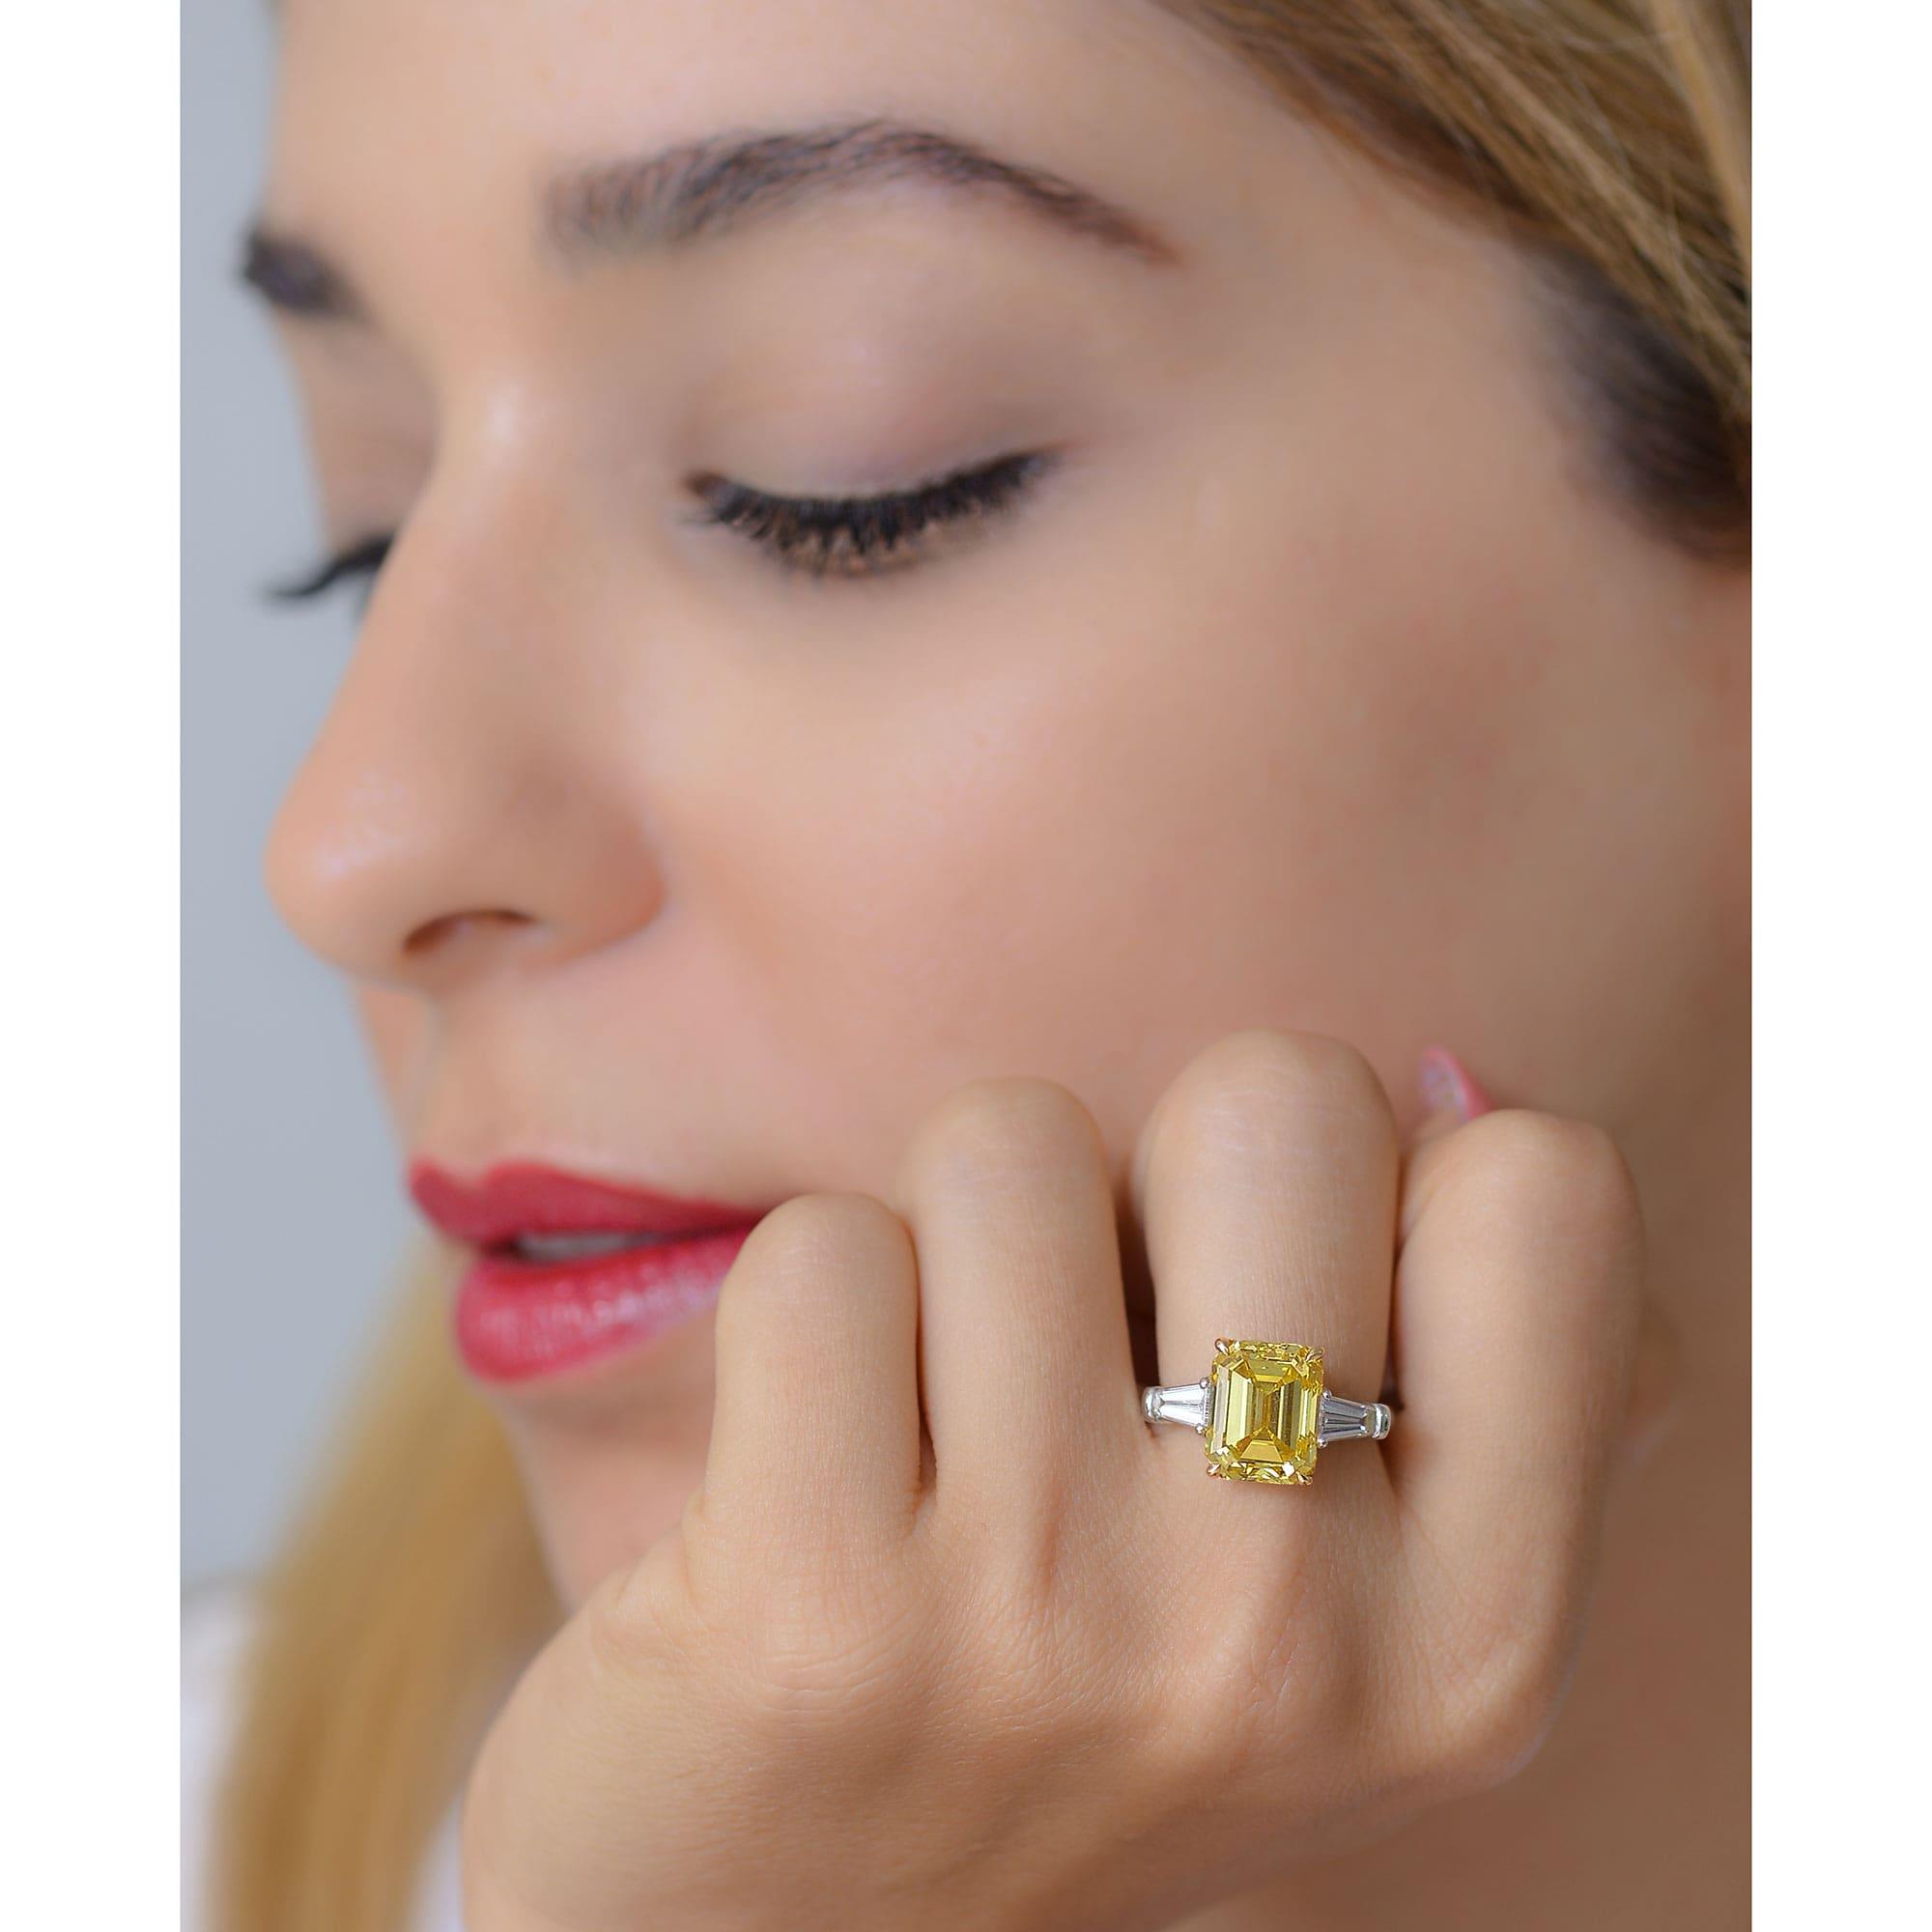 The Leibish & Co. 5.91 ct Fancy Vivid Yellow Emerald cut diamond ring